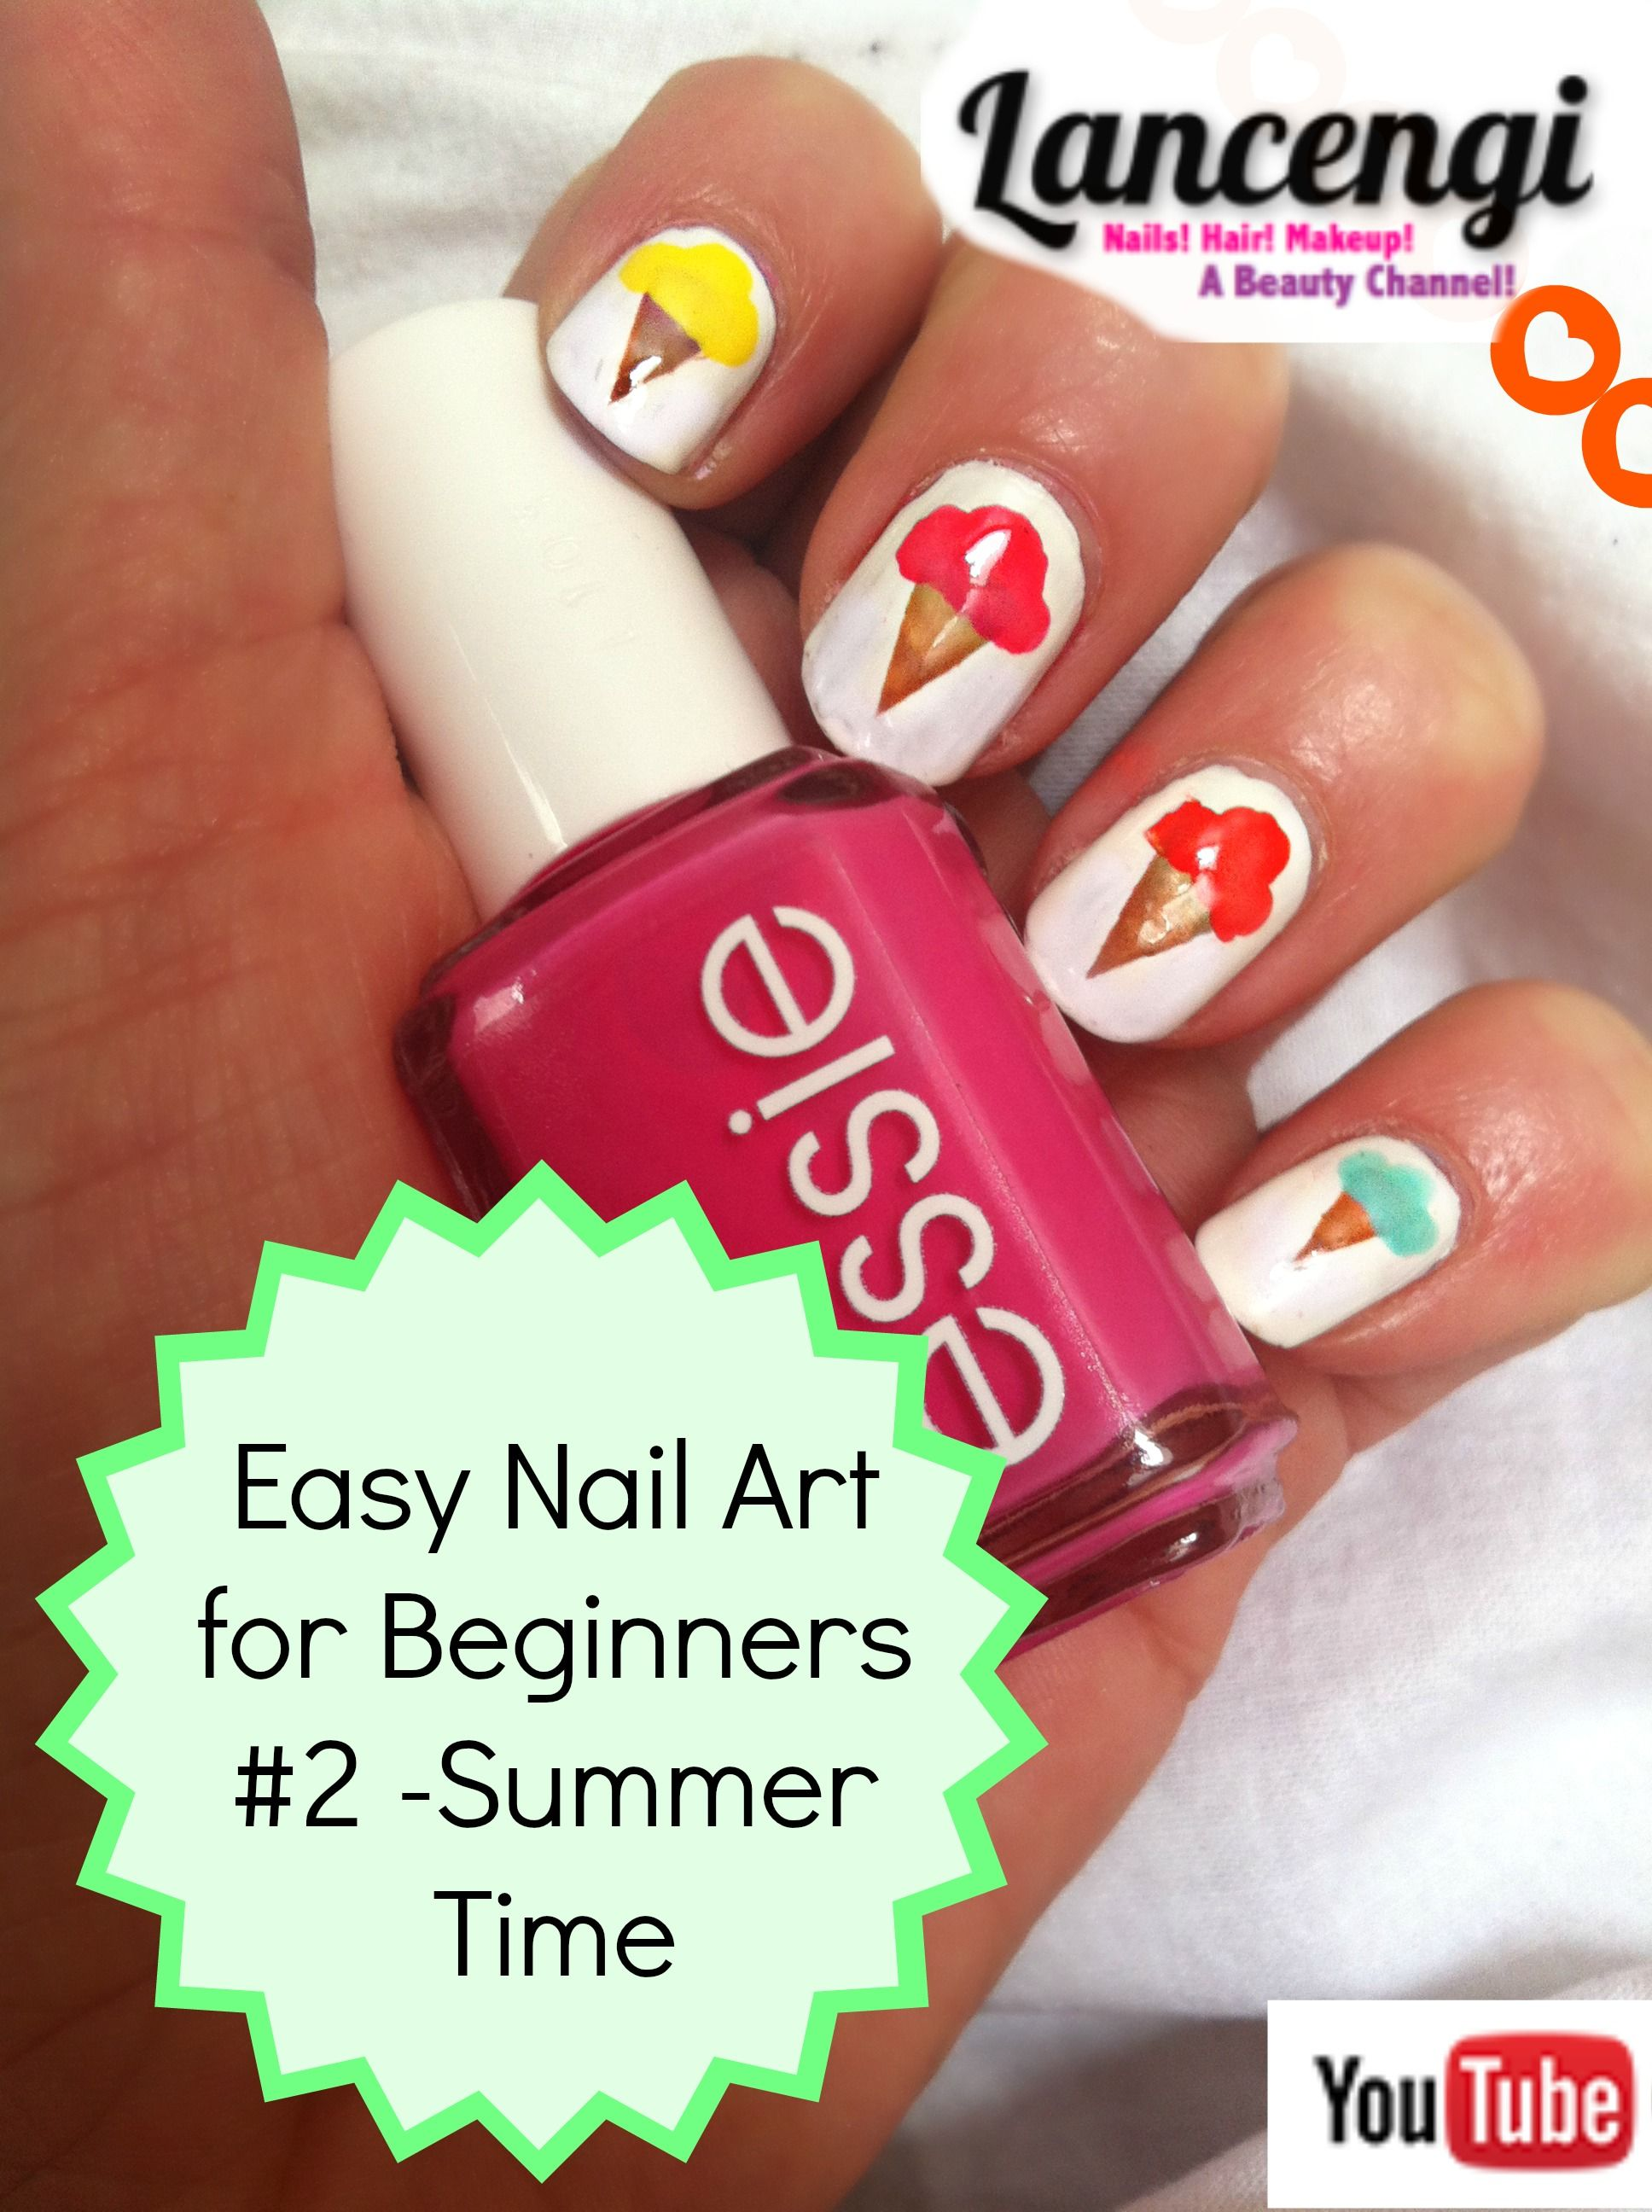 Easy Nail Art Tutorials for Beginners with Short Nails! Summer Nail ...